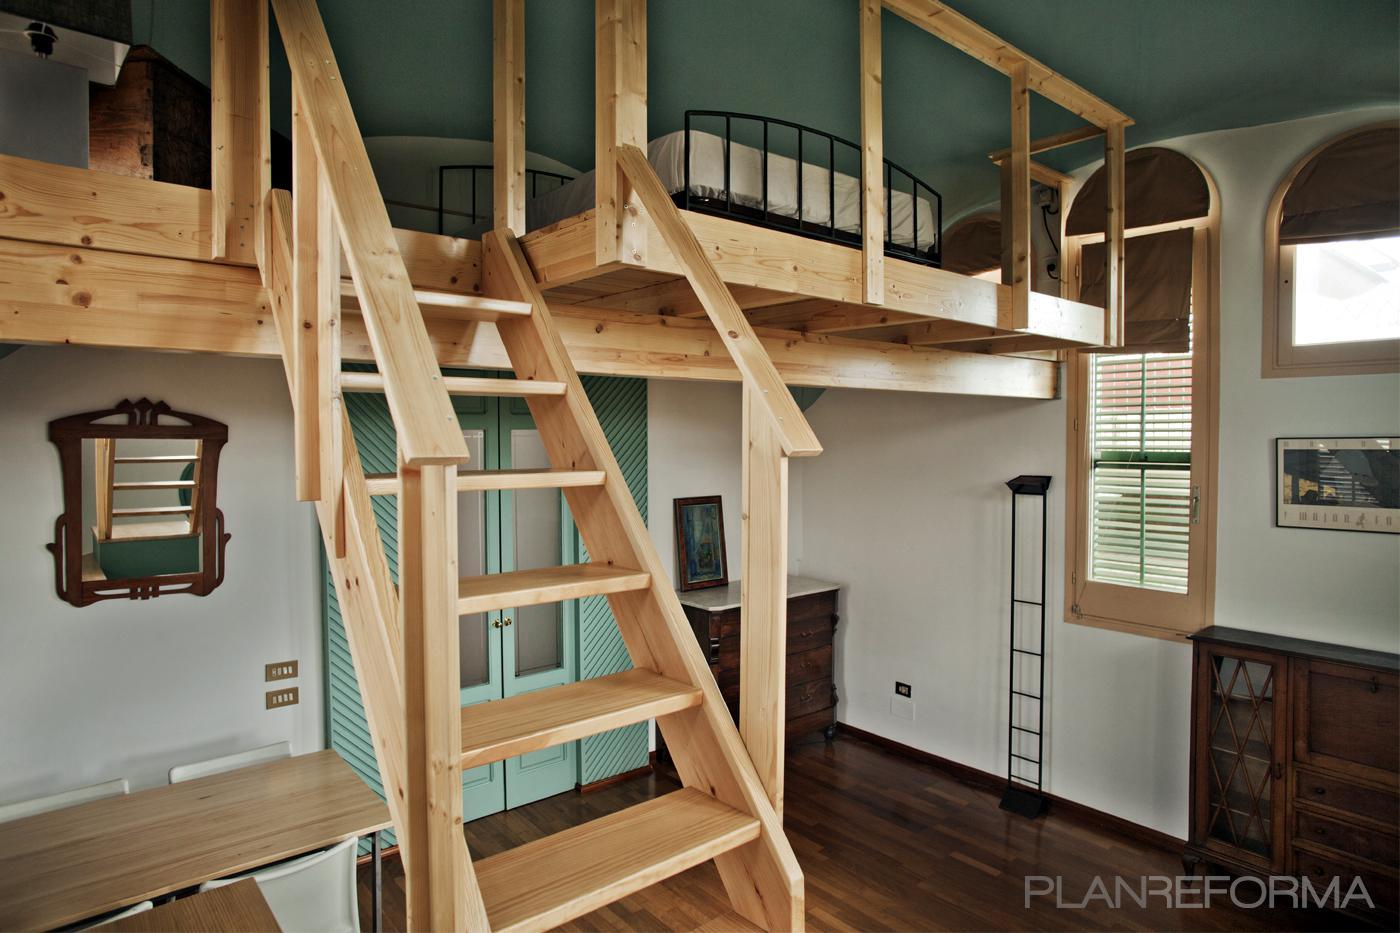 Dormitorio, Salon style moderno color turquesa, marron, marron, blanco  diseñado por mobla manufactured architecture   Gremio